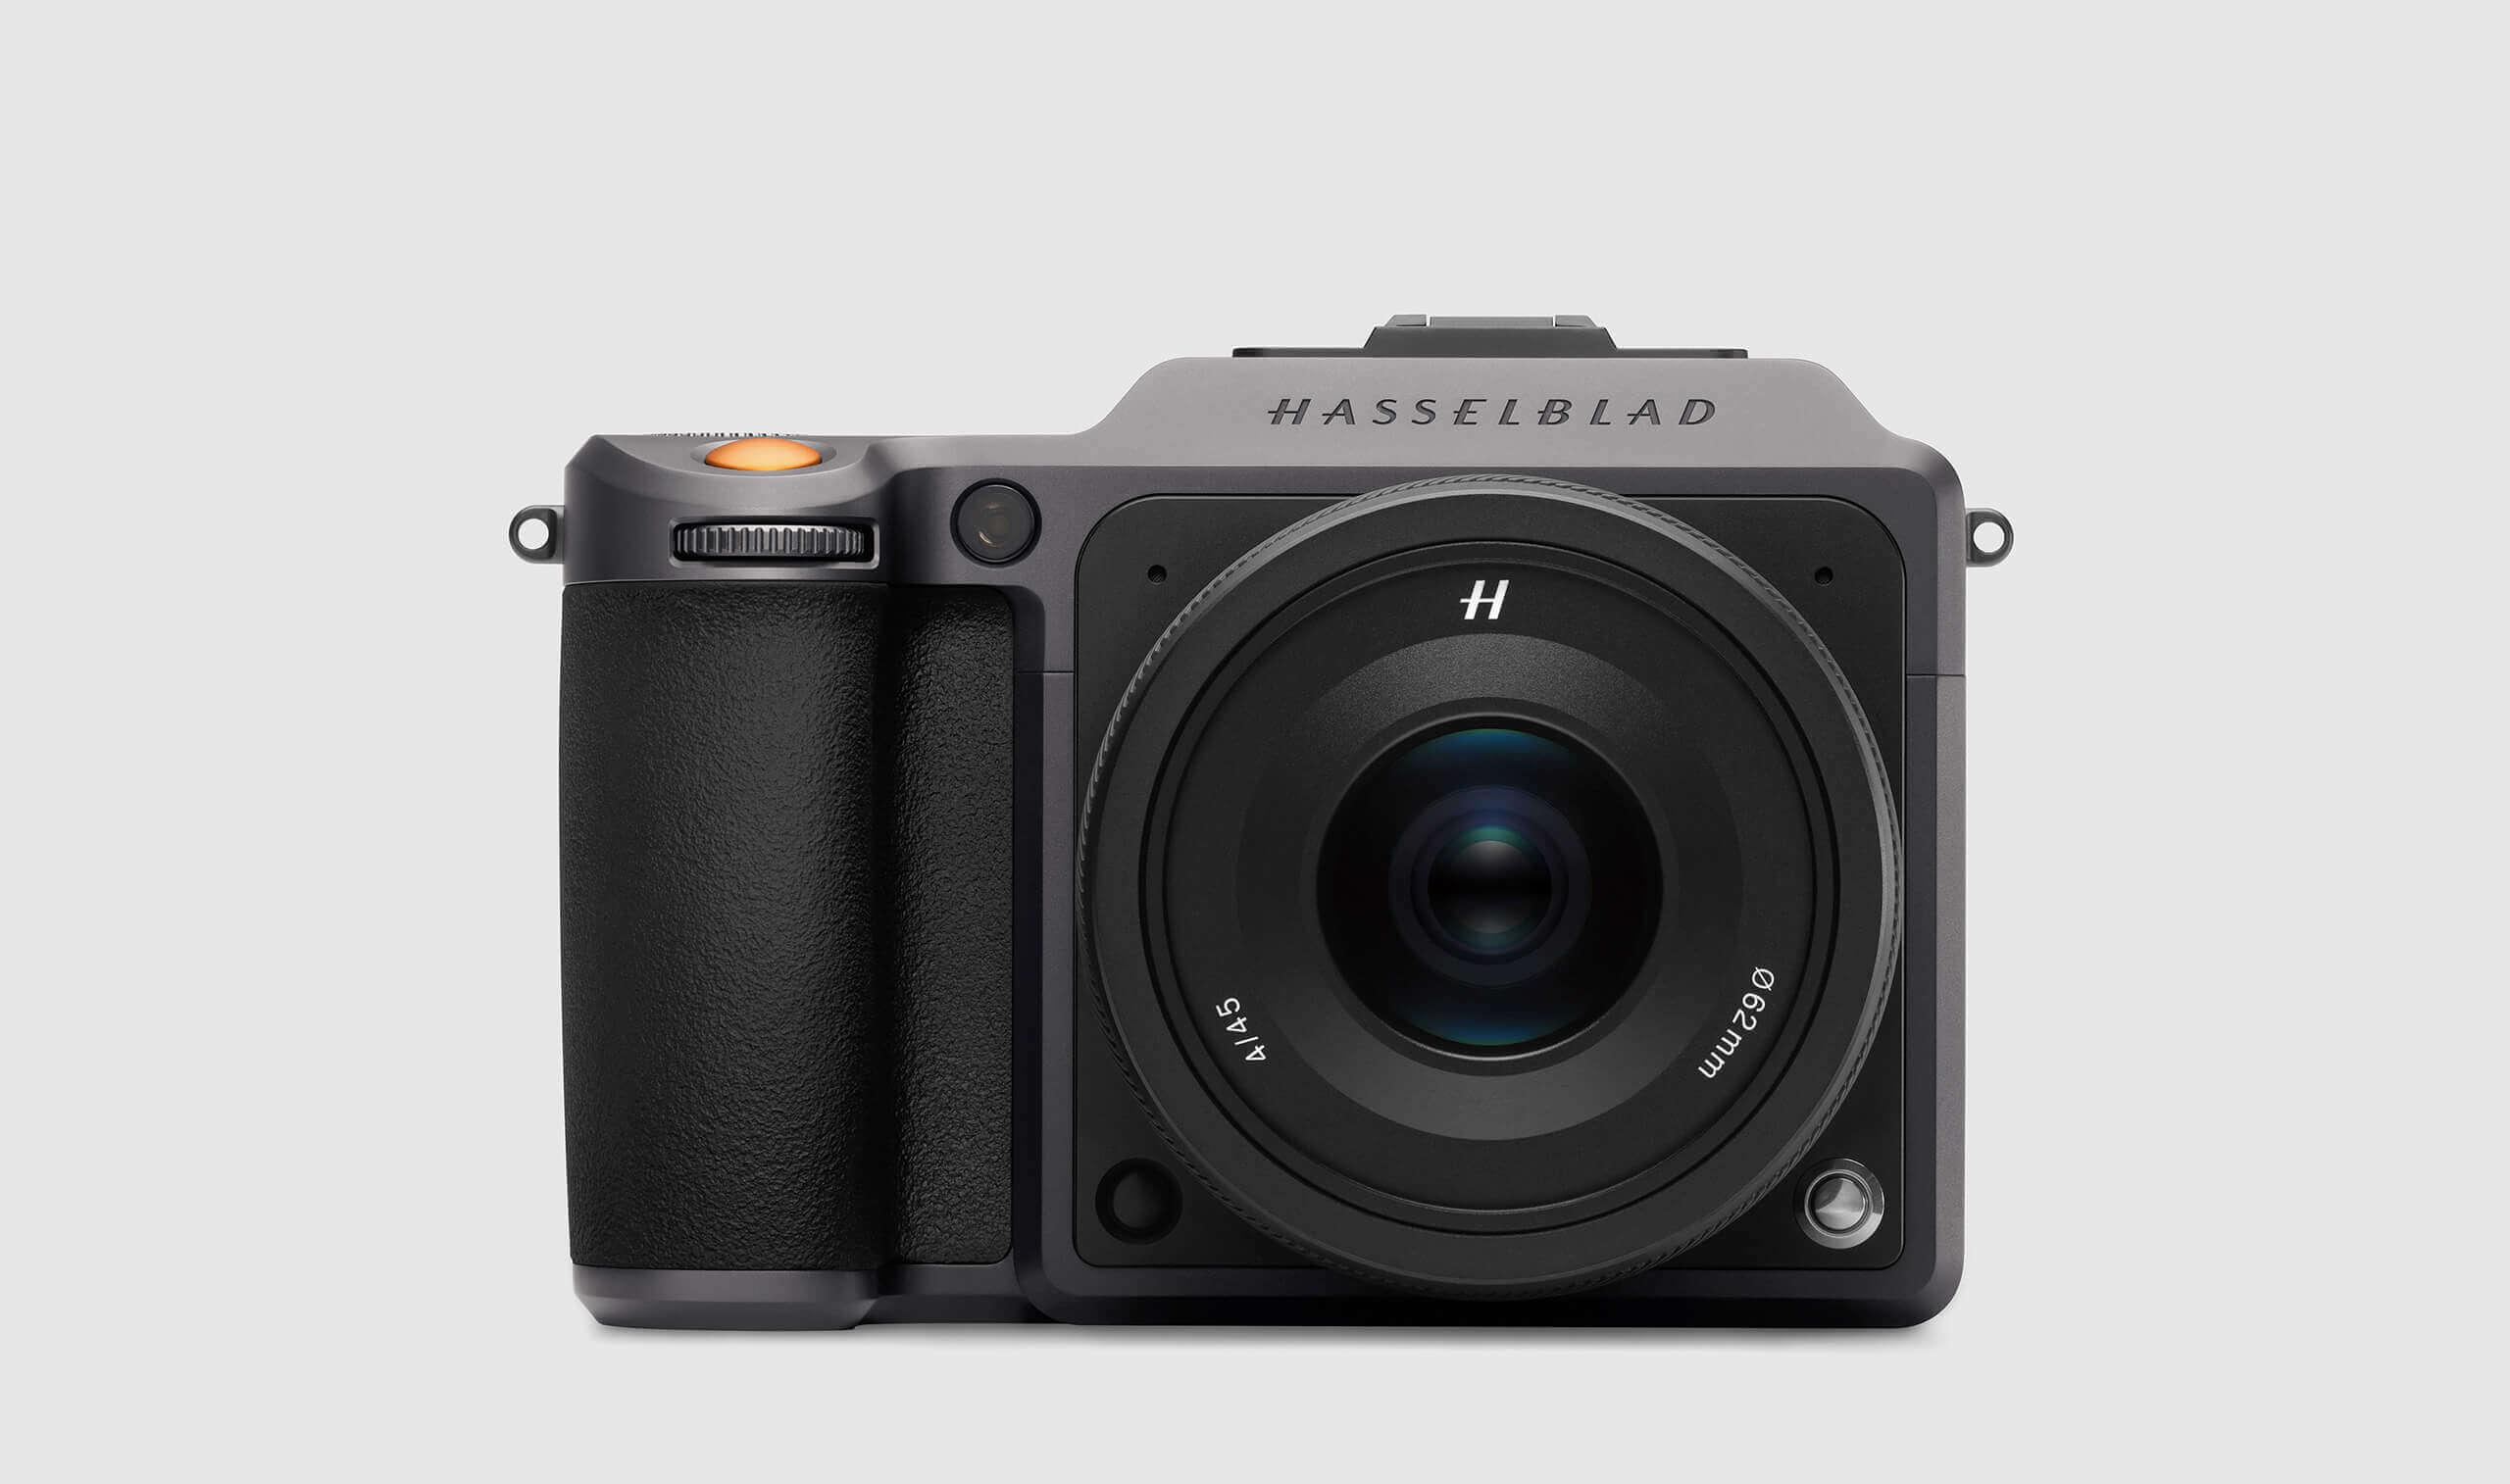 Hasselbladは世界最高峰のカメラメーカー